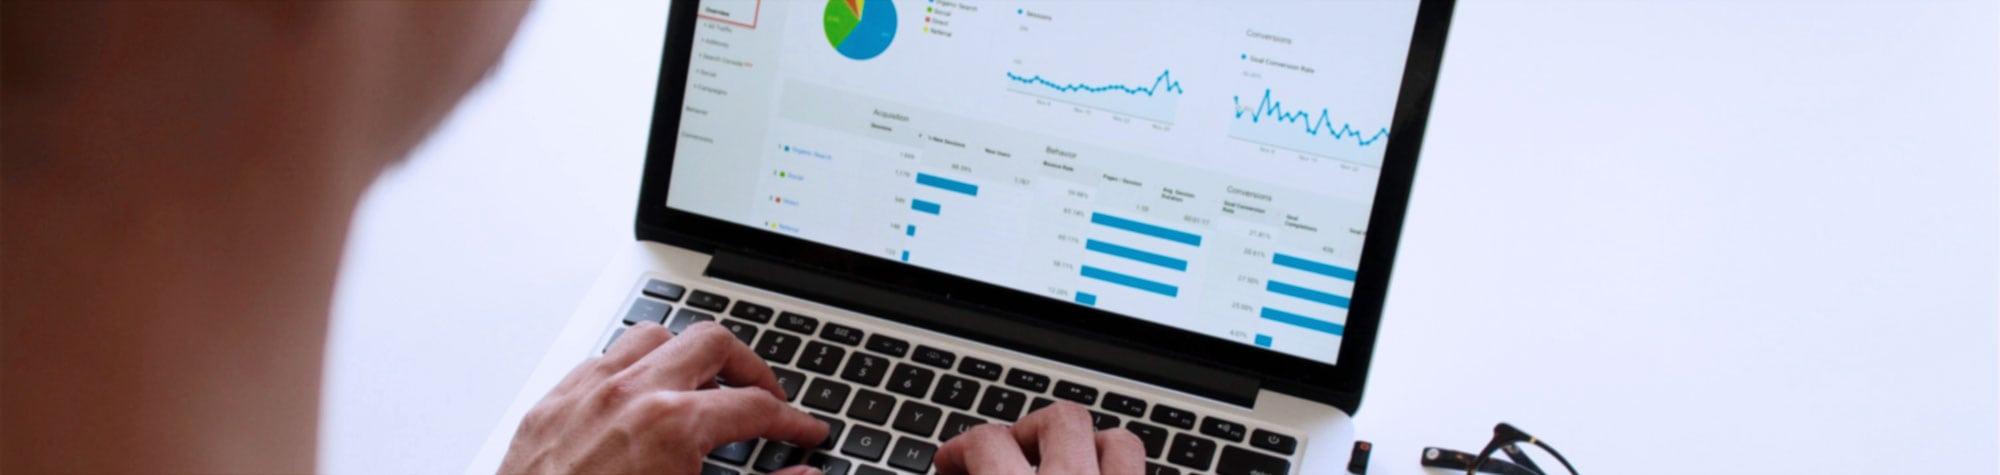 Paid Search Service: Client Case Study